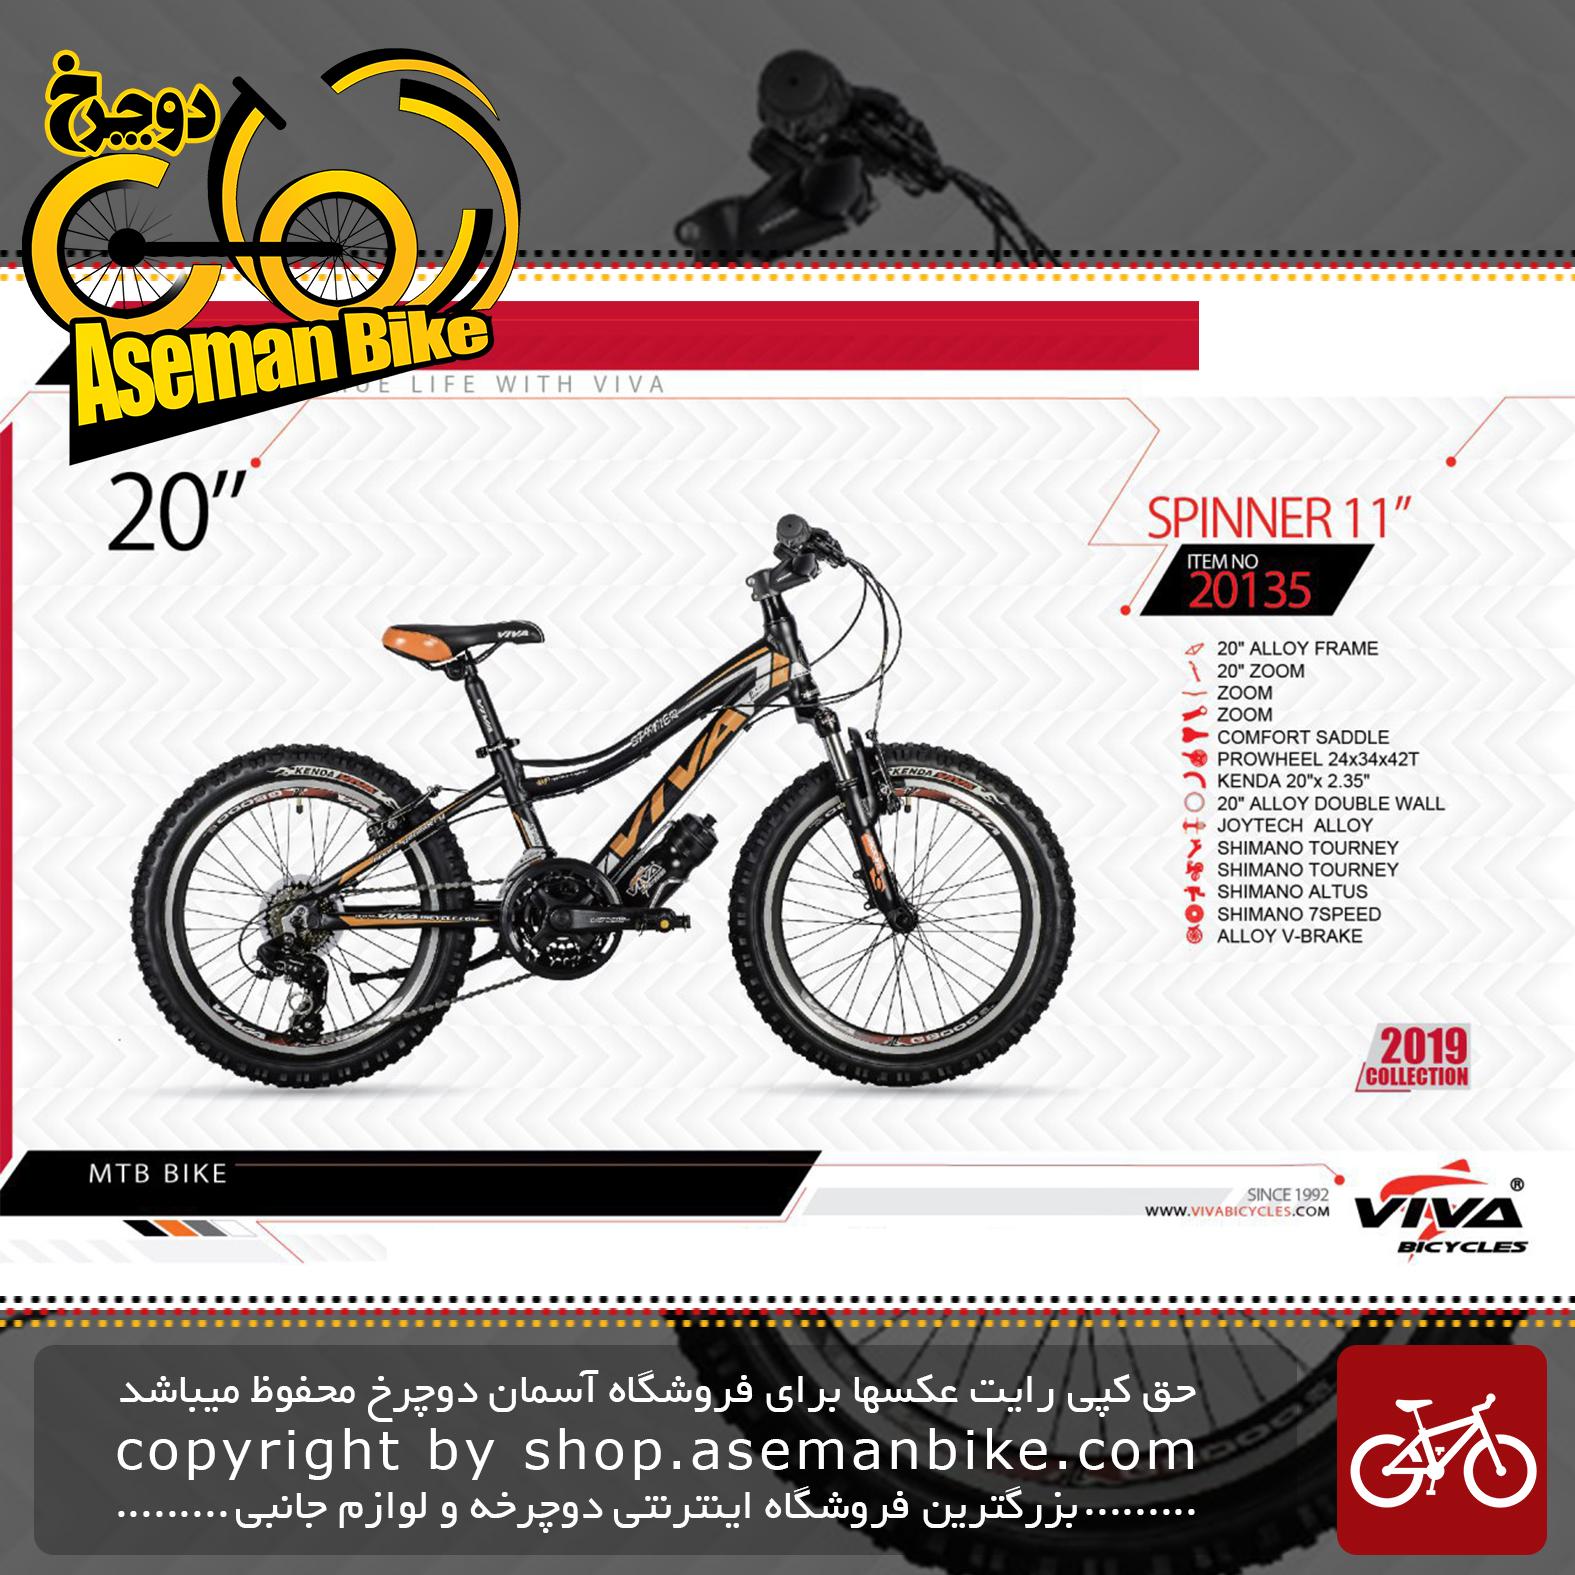 دوچرخه کوهستان سایز 20 ویوا مدل اسپینر 11 VIVA SPINNER 11 SIZE 20 20192019